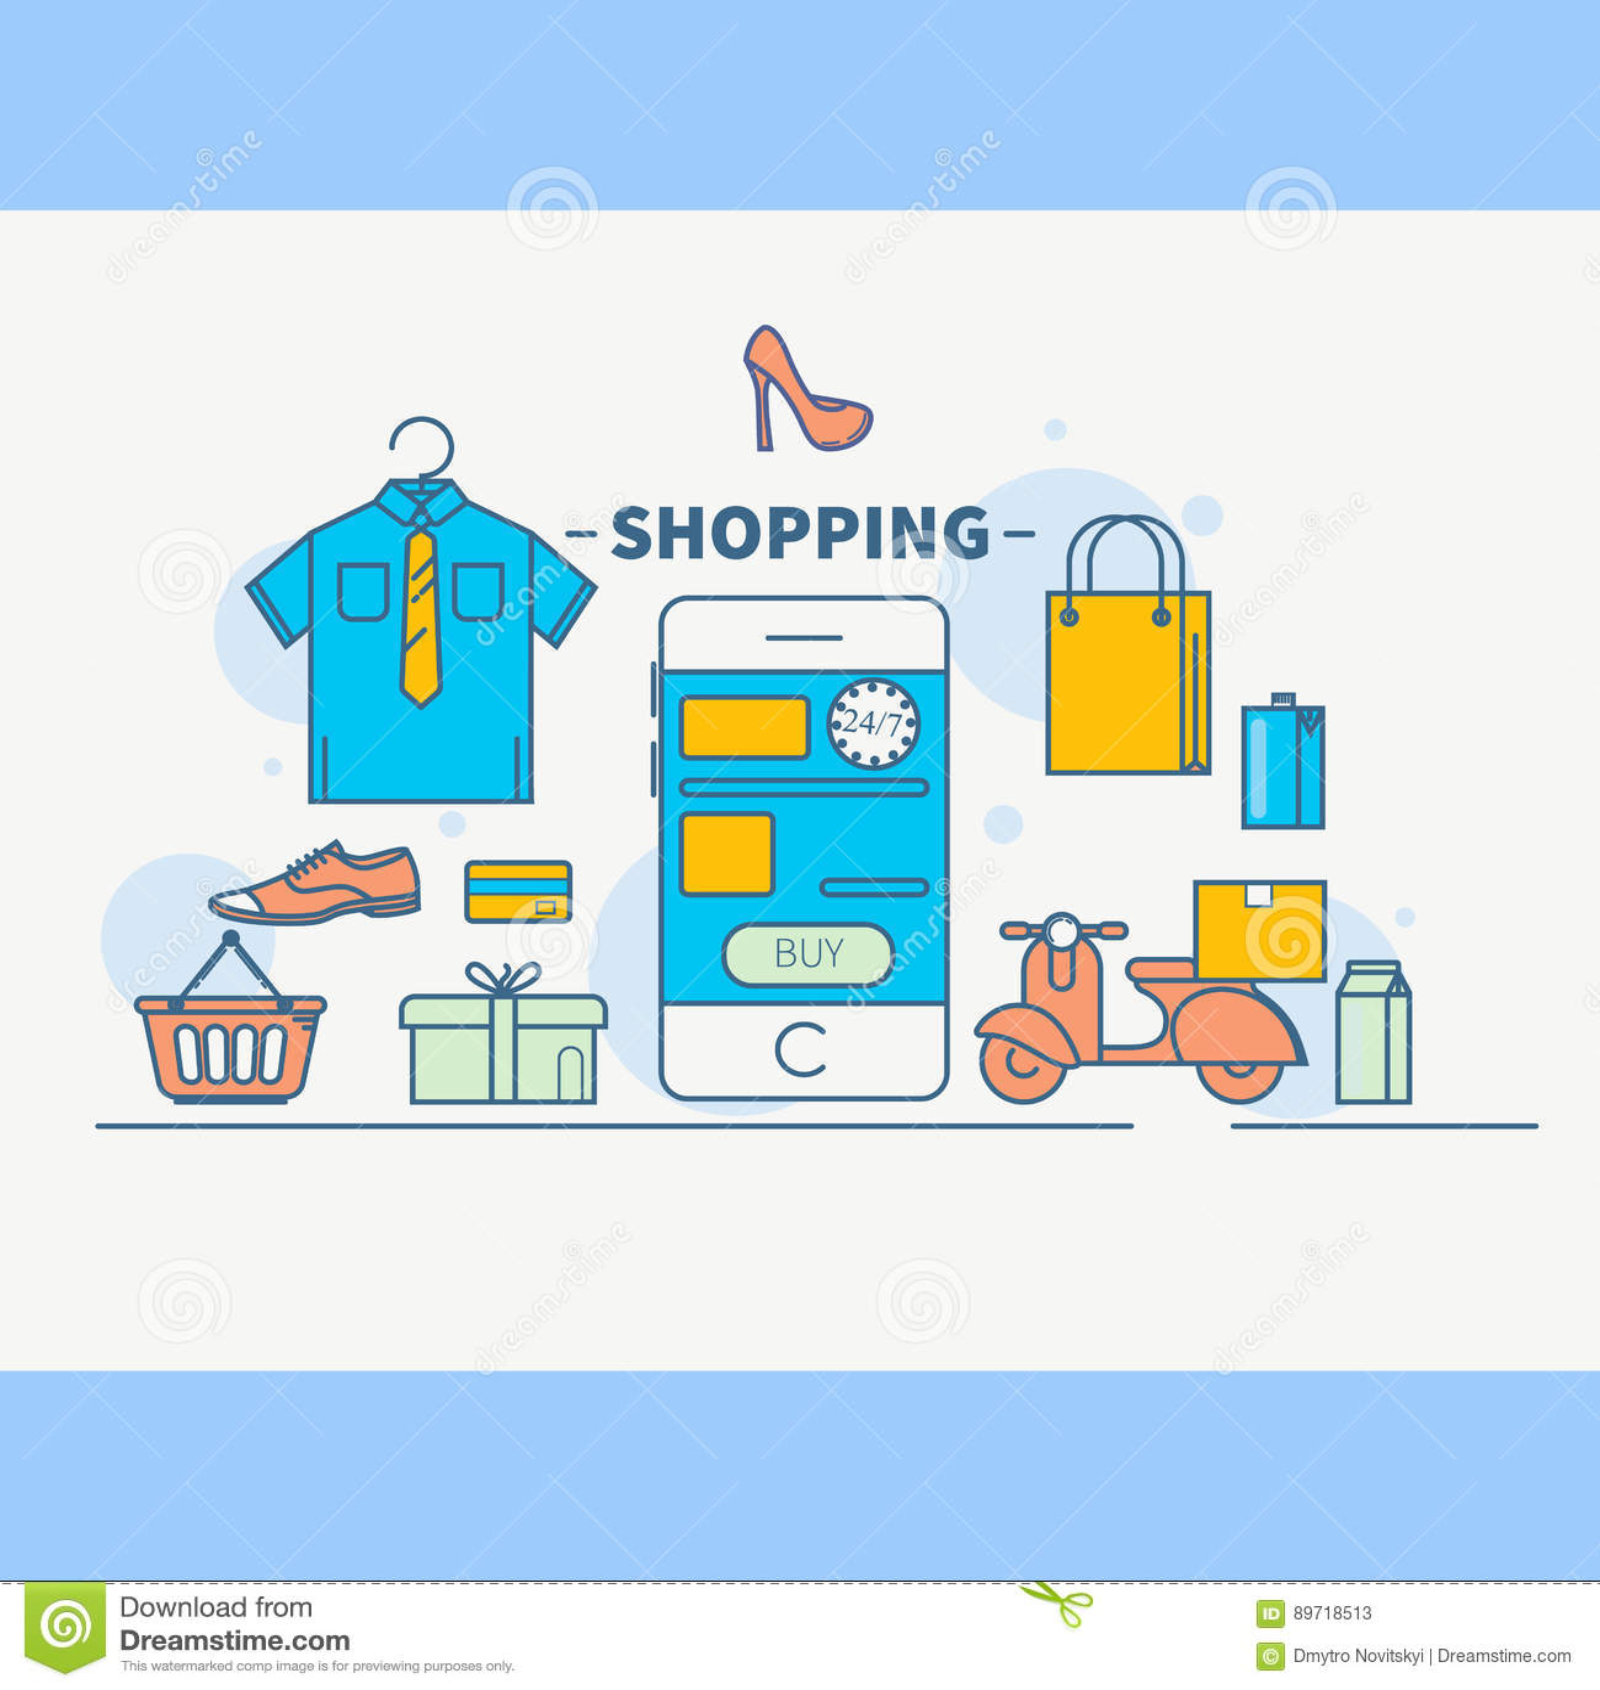 Shopping network online